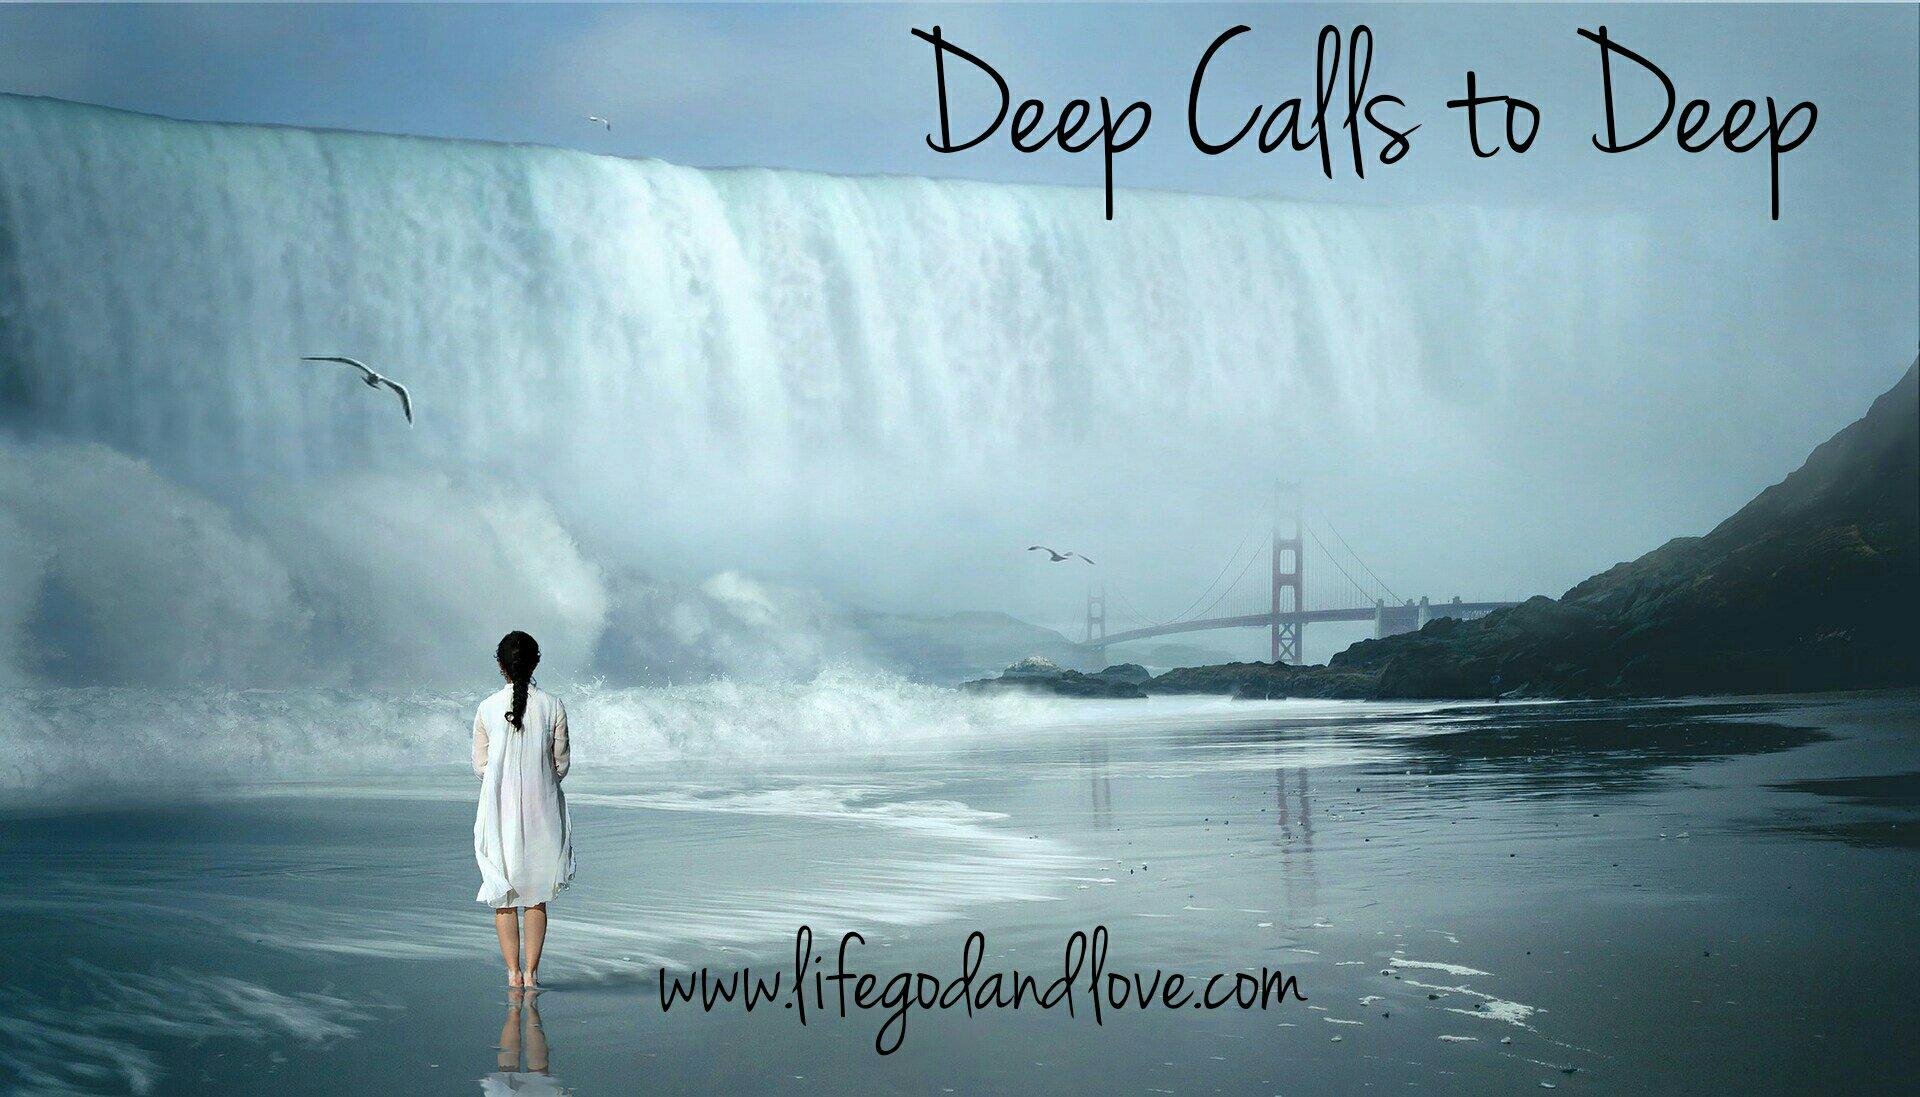 Deep Calls to Deep